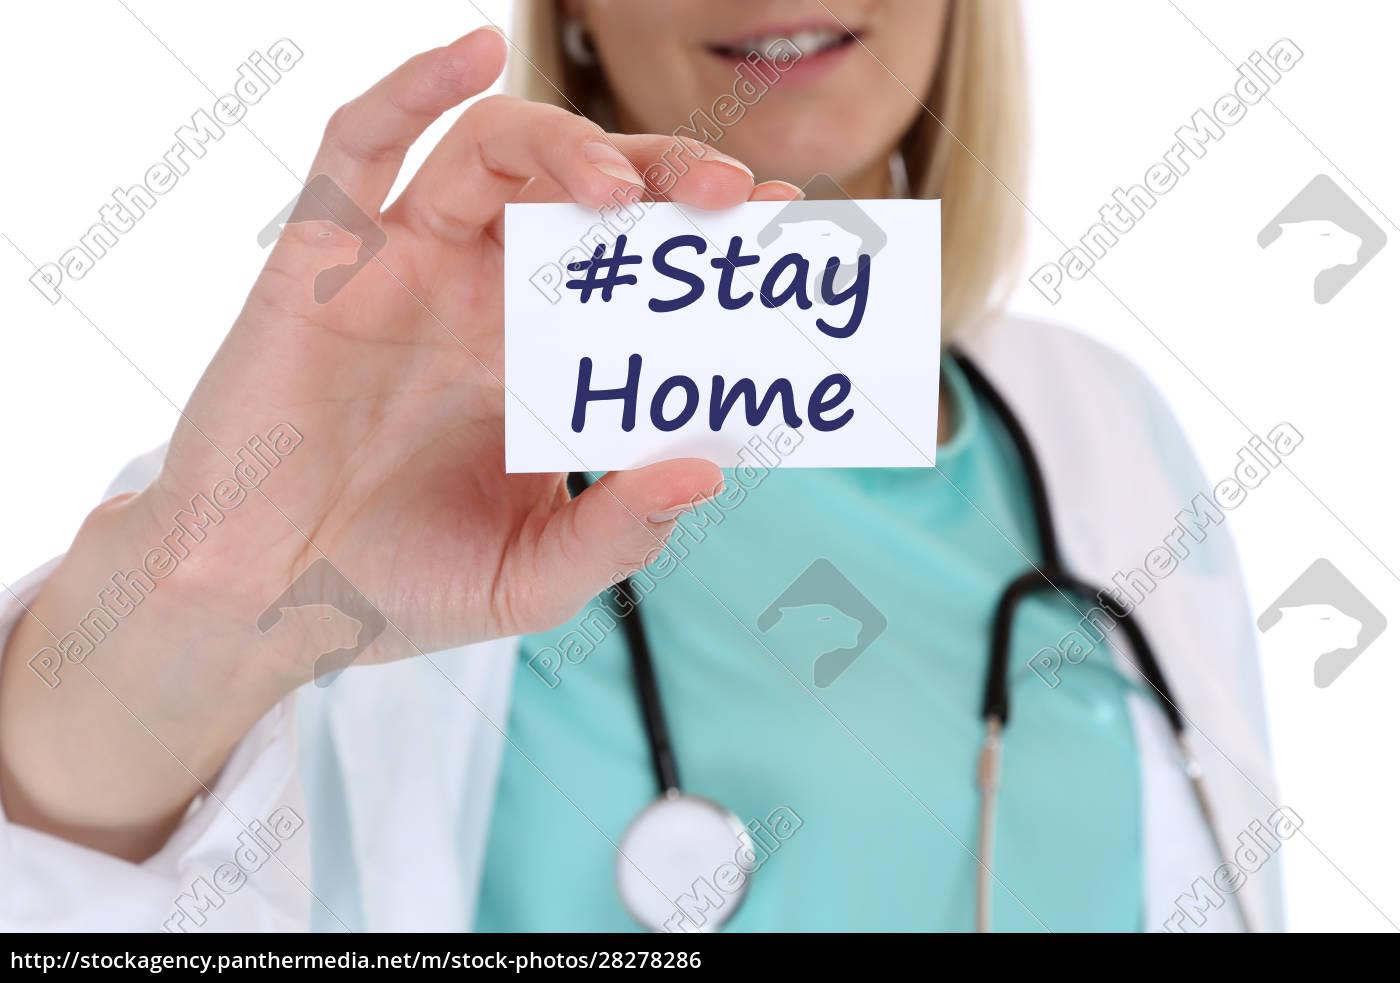 stay, home, hashtag, stayhome, corona, virus - 28278286